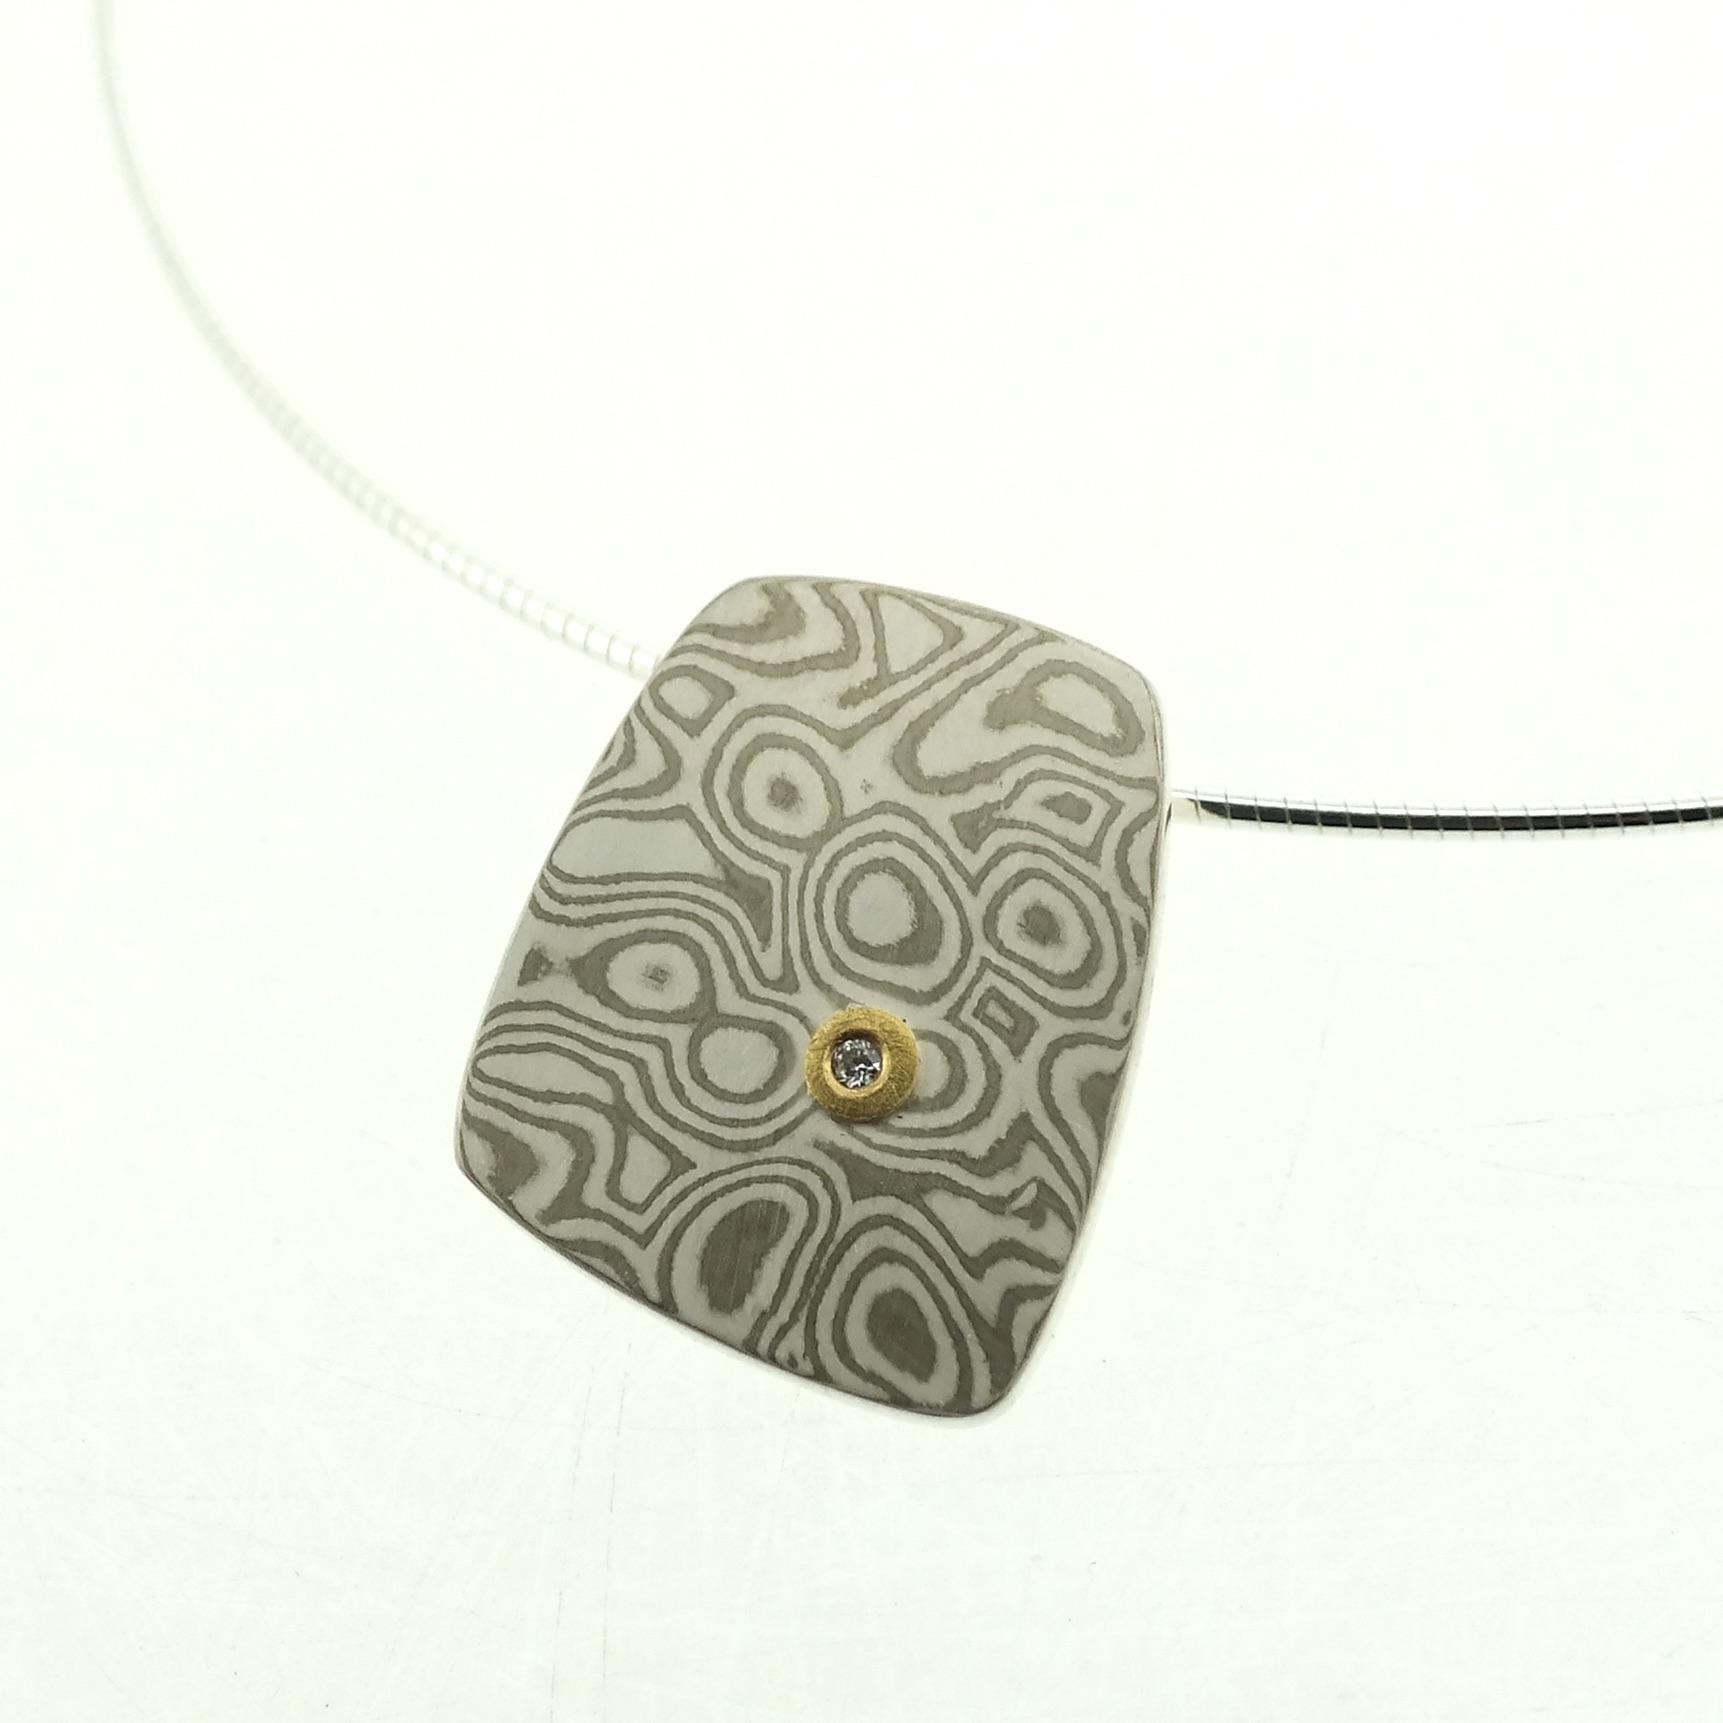 18k white gold and silver mokume gane large Fower Neukit pendant with 22k gold and diamond detail